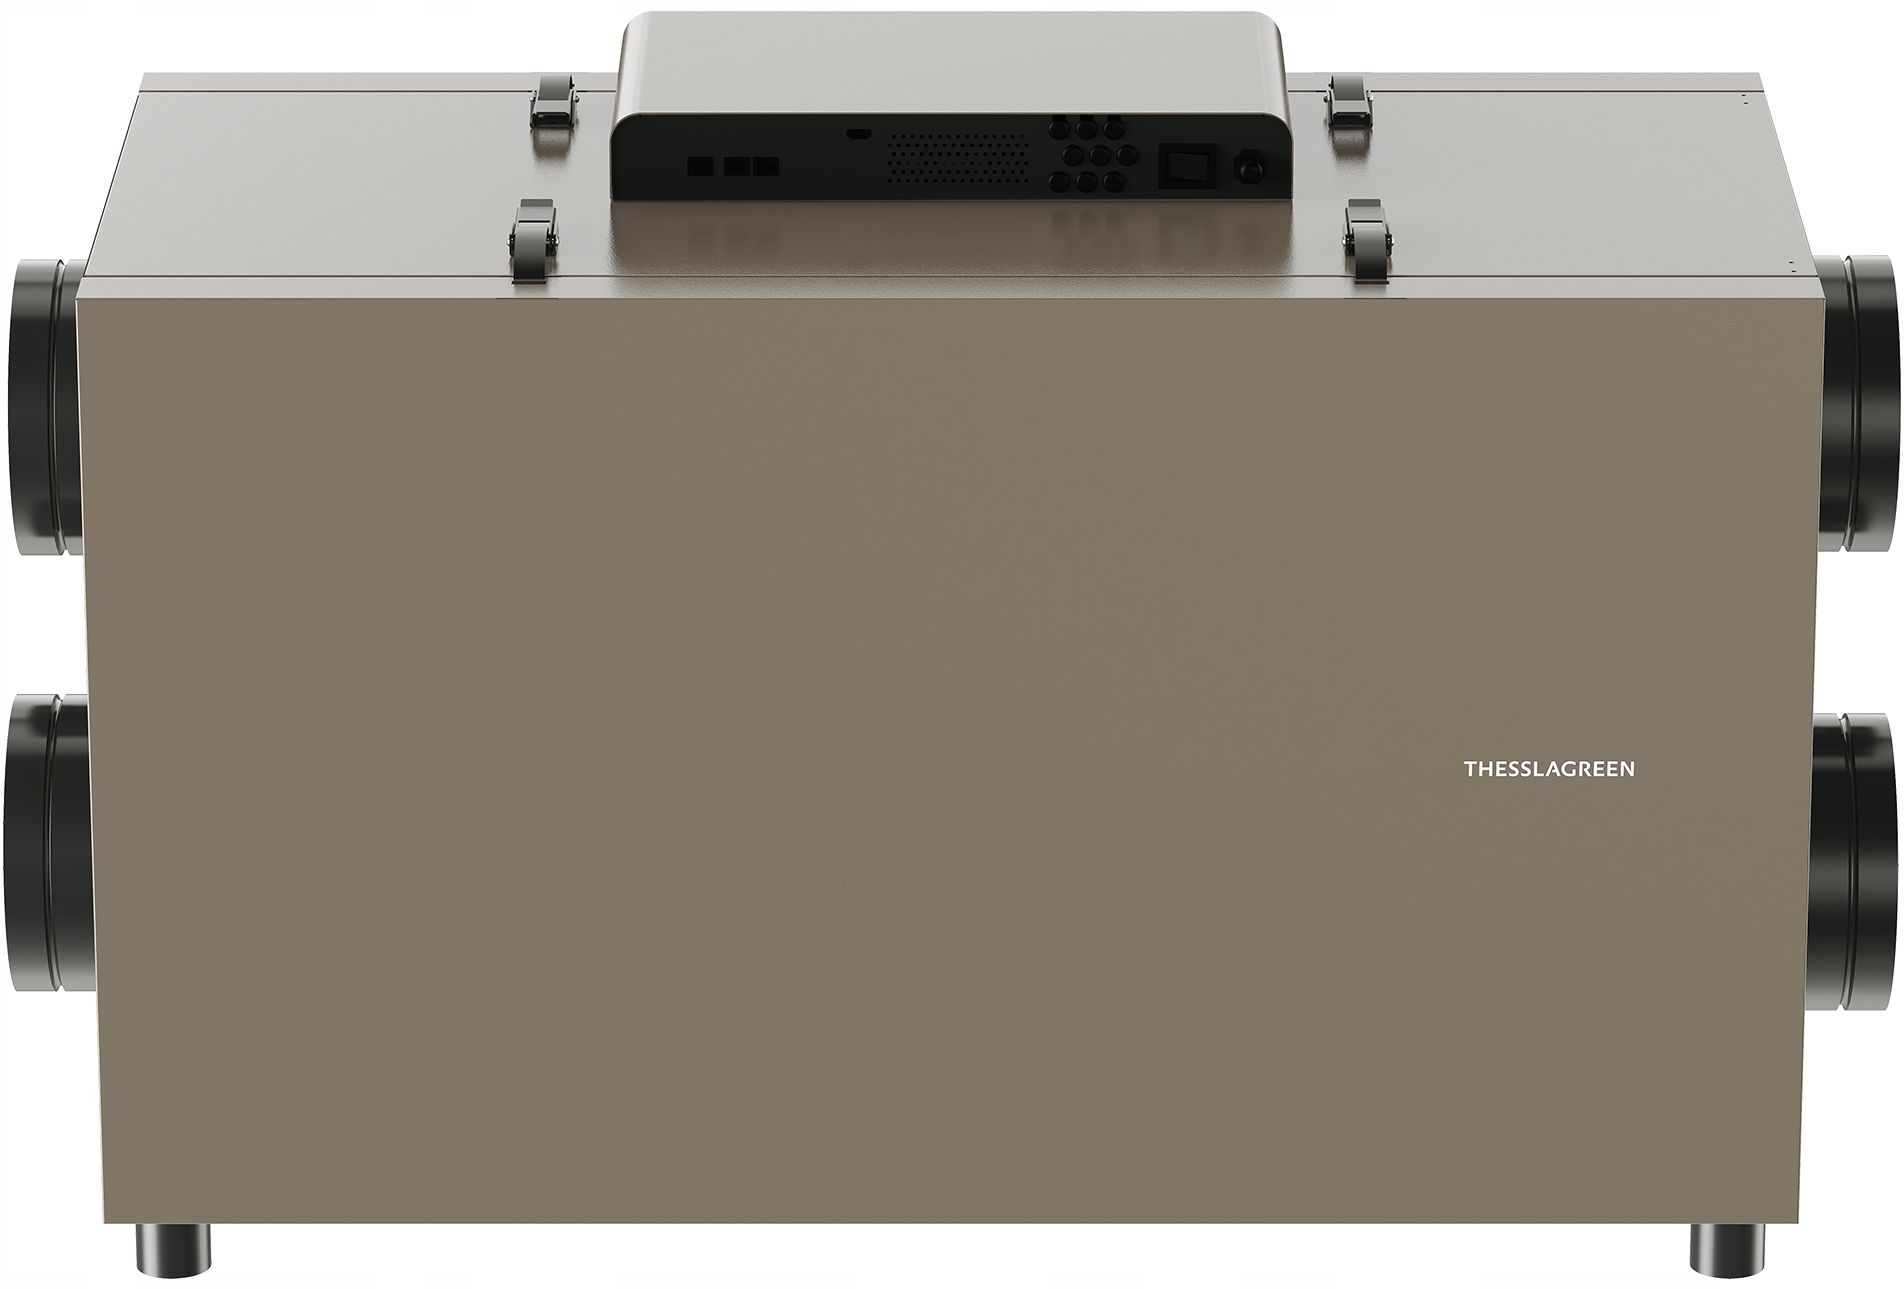 Rekuperator Thessla AirPack Home 400h Energy montaż Centrala wentylacyjna Thessla Airpack Home 400h Energy montaż